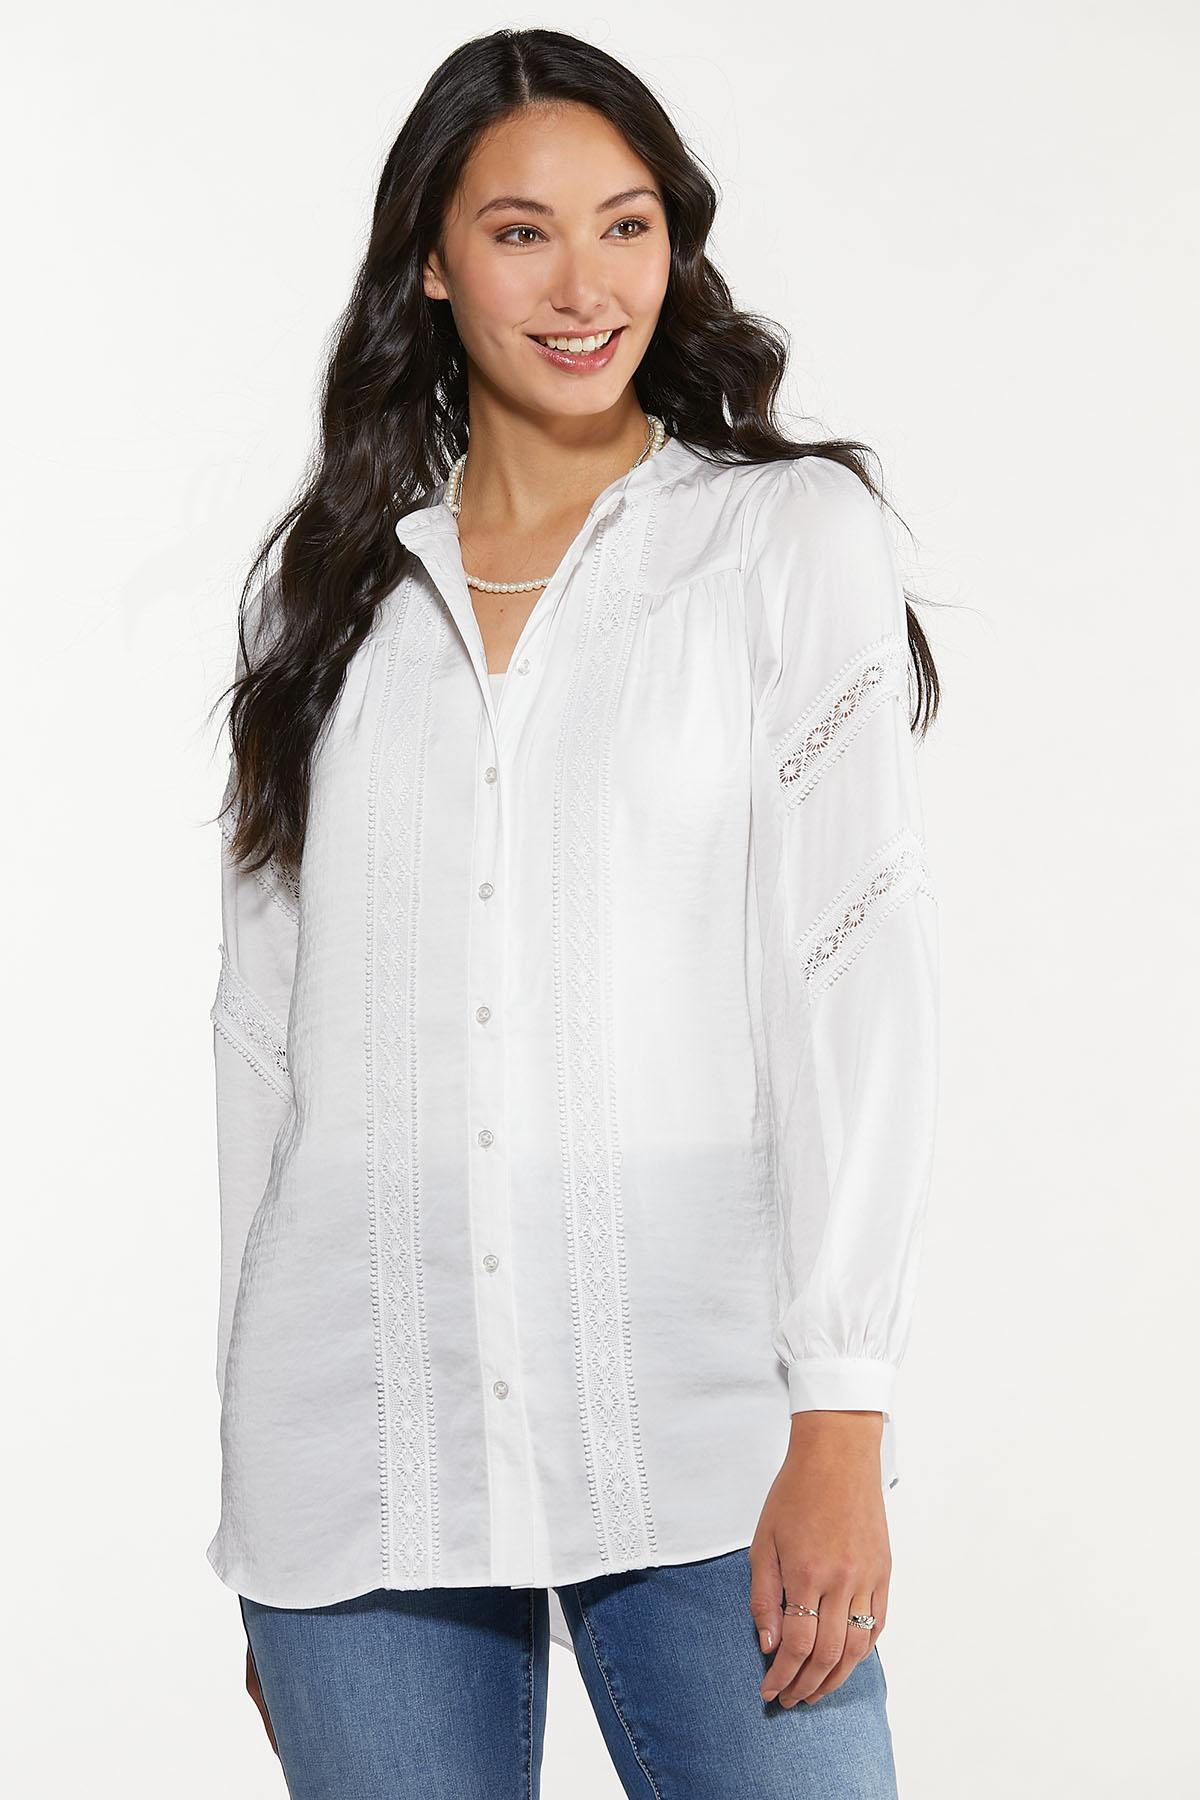 Lace Trim Tunic